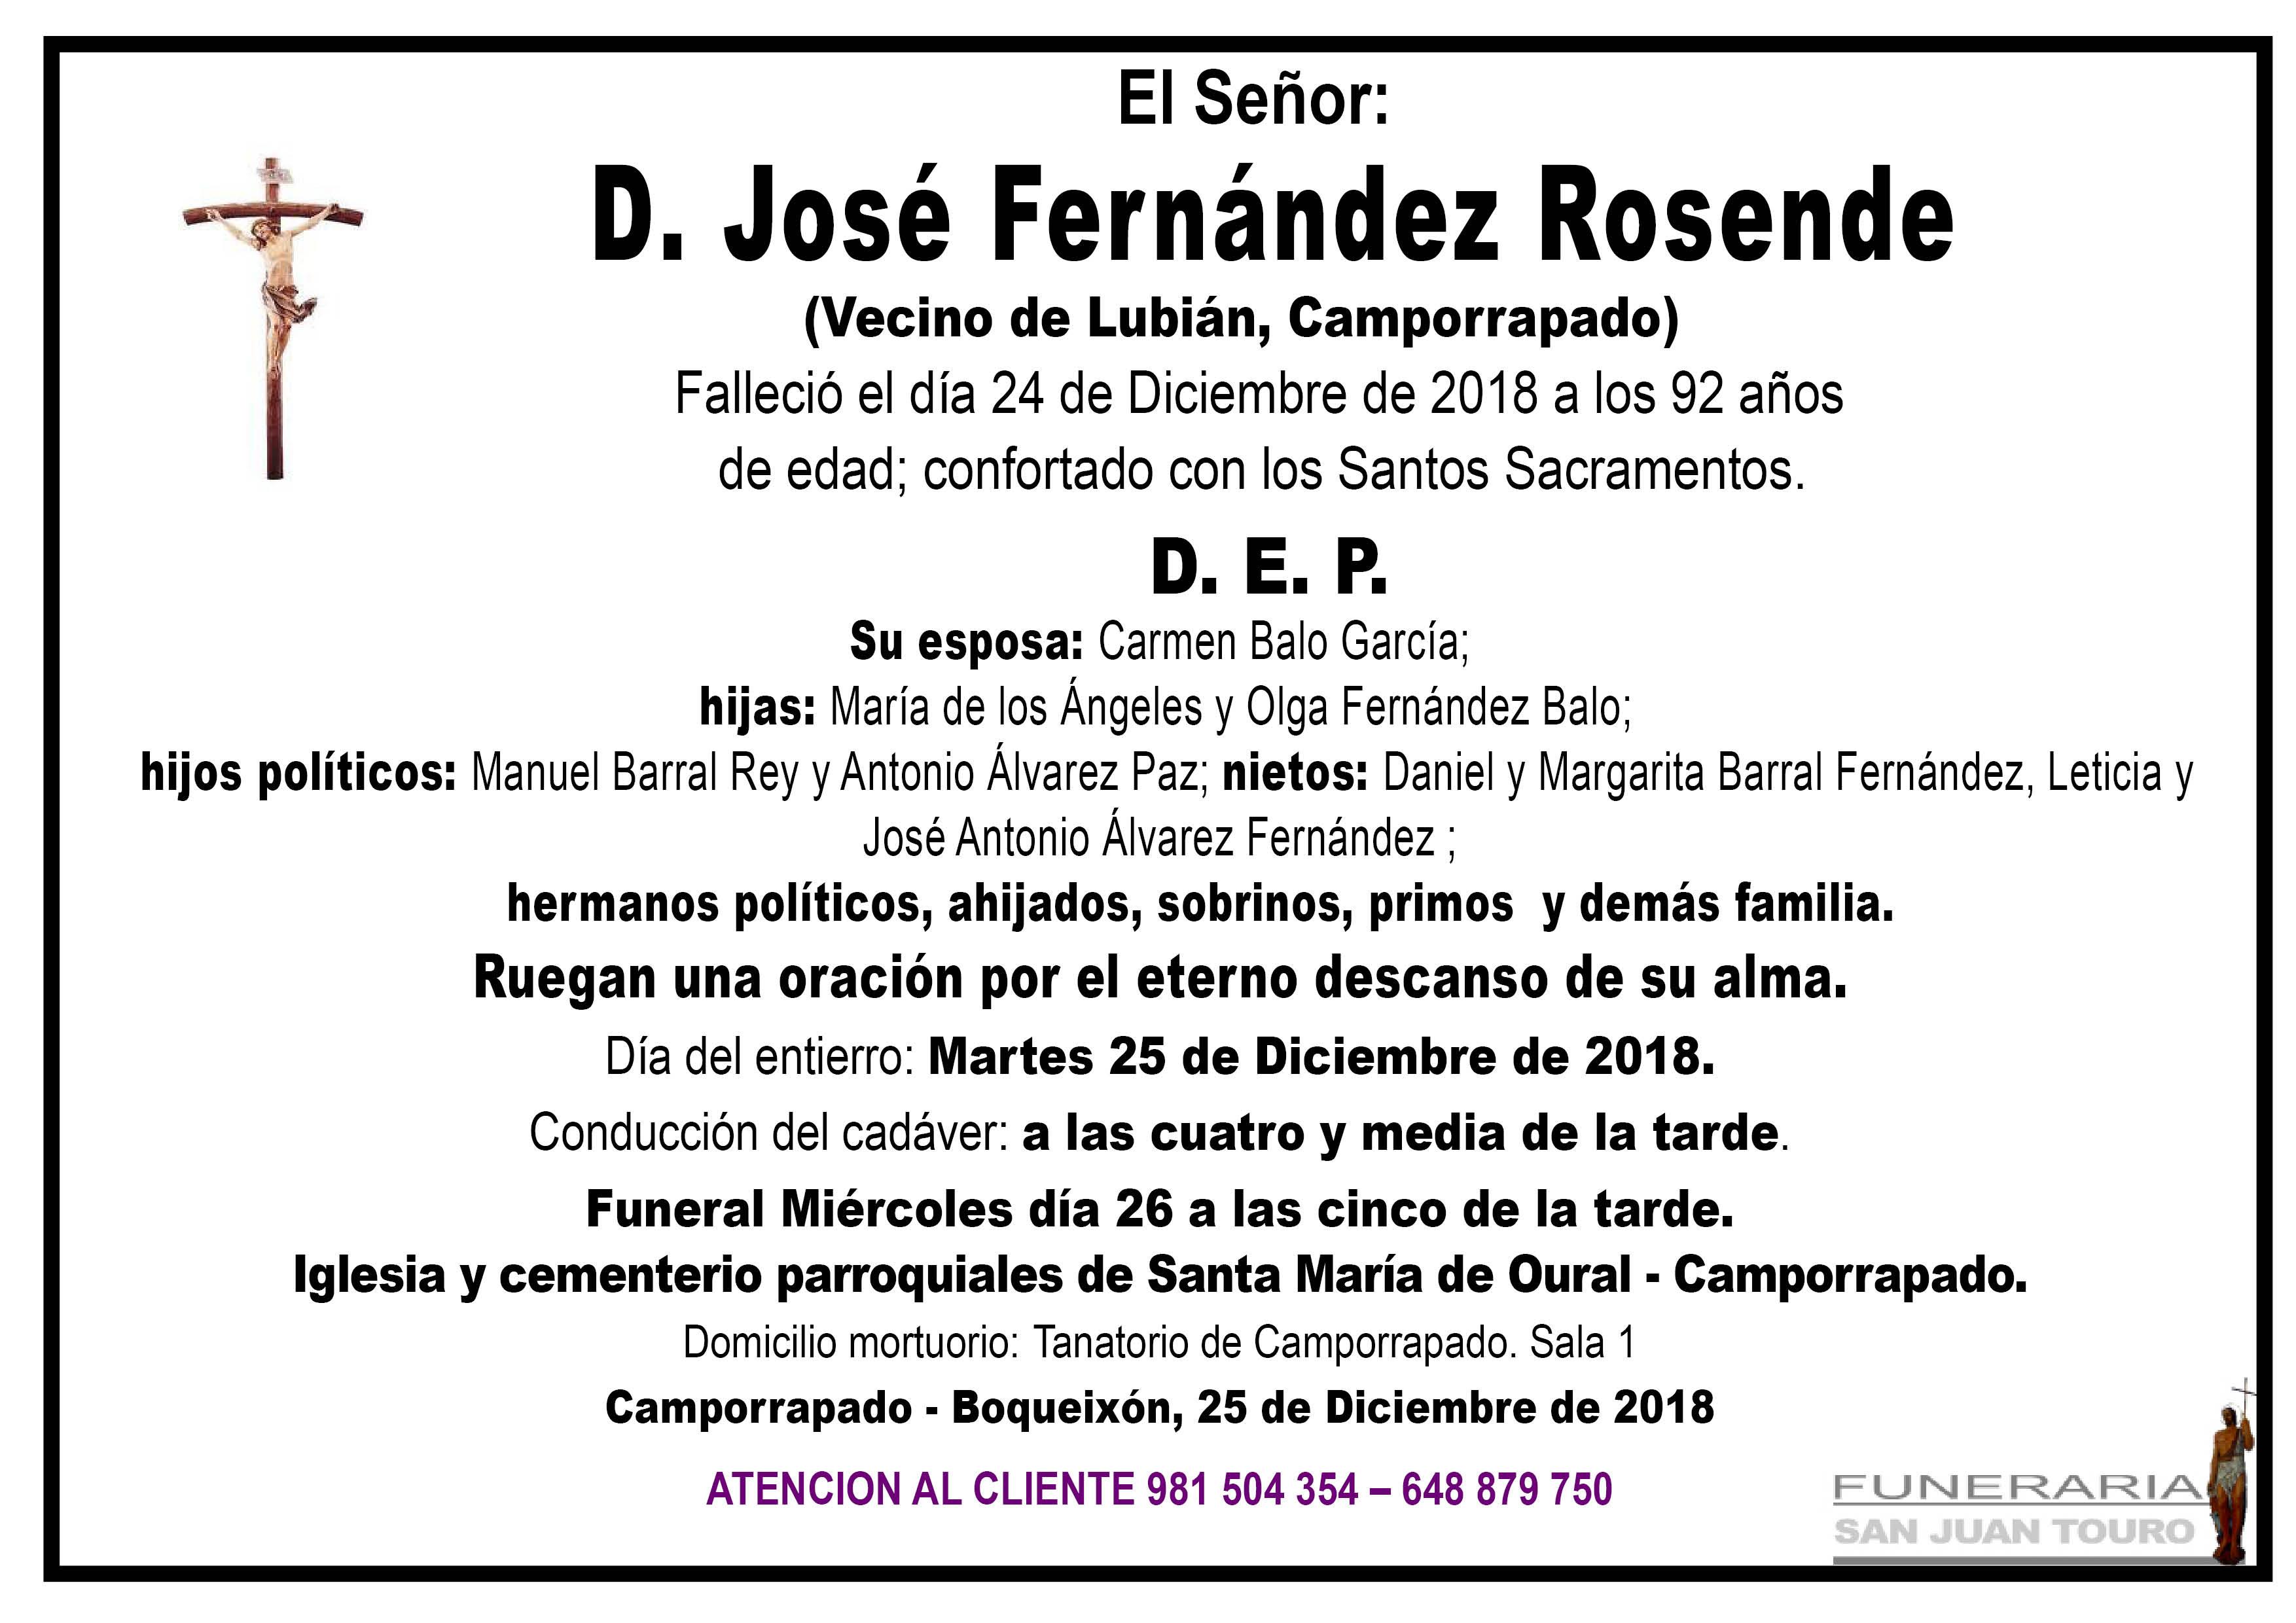 Esquela de SEPELIO DE DON JOSÉ FERNÁNDEZ ROSENDE